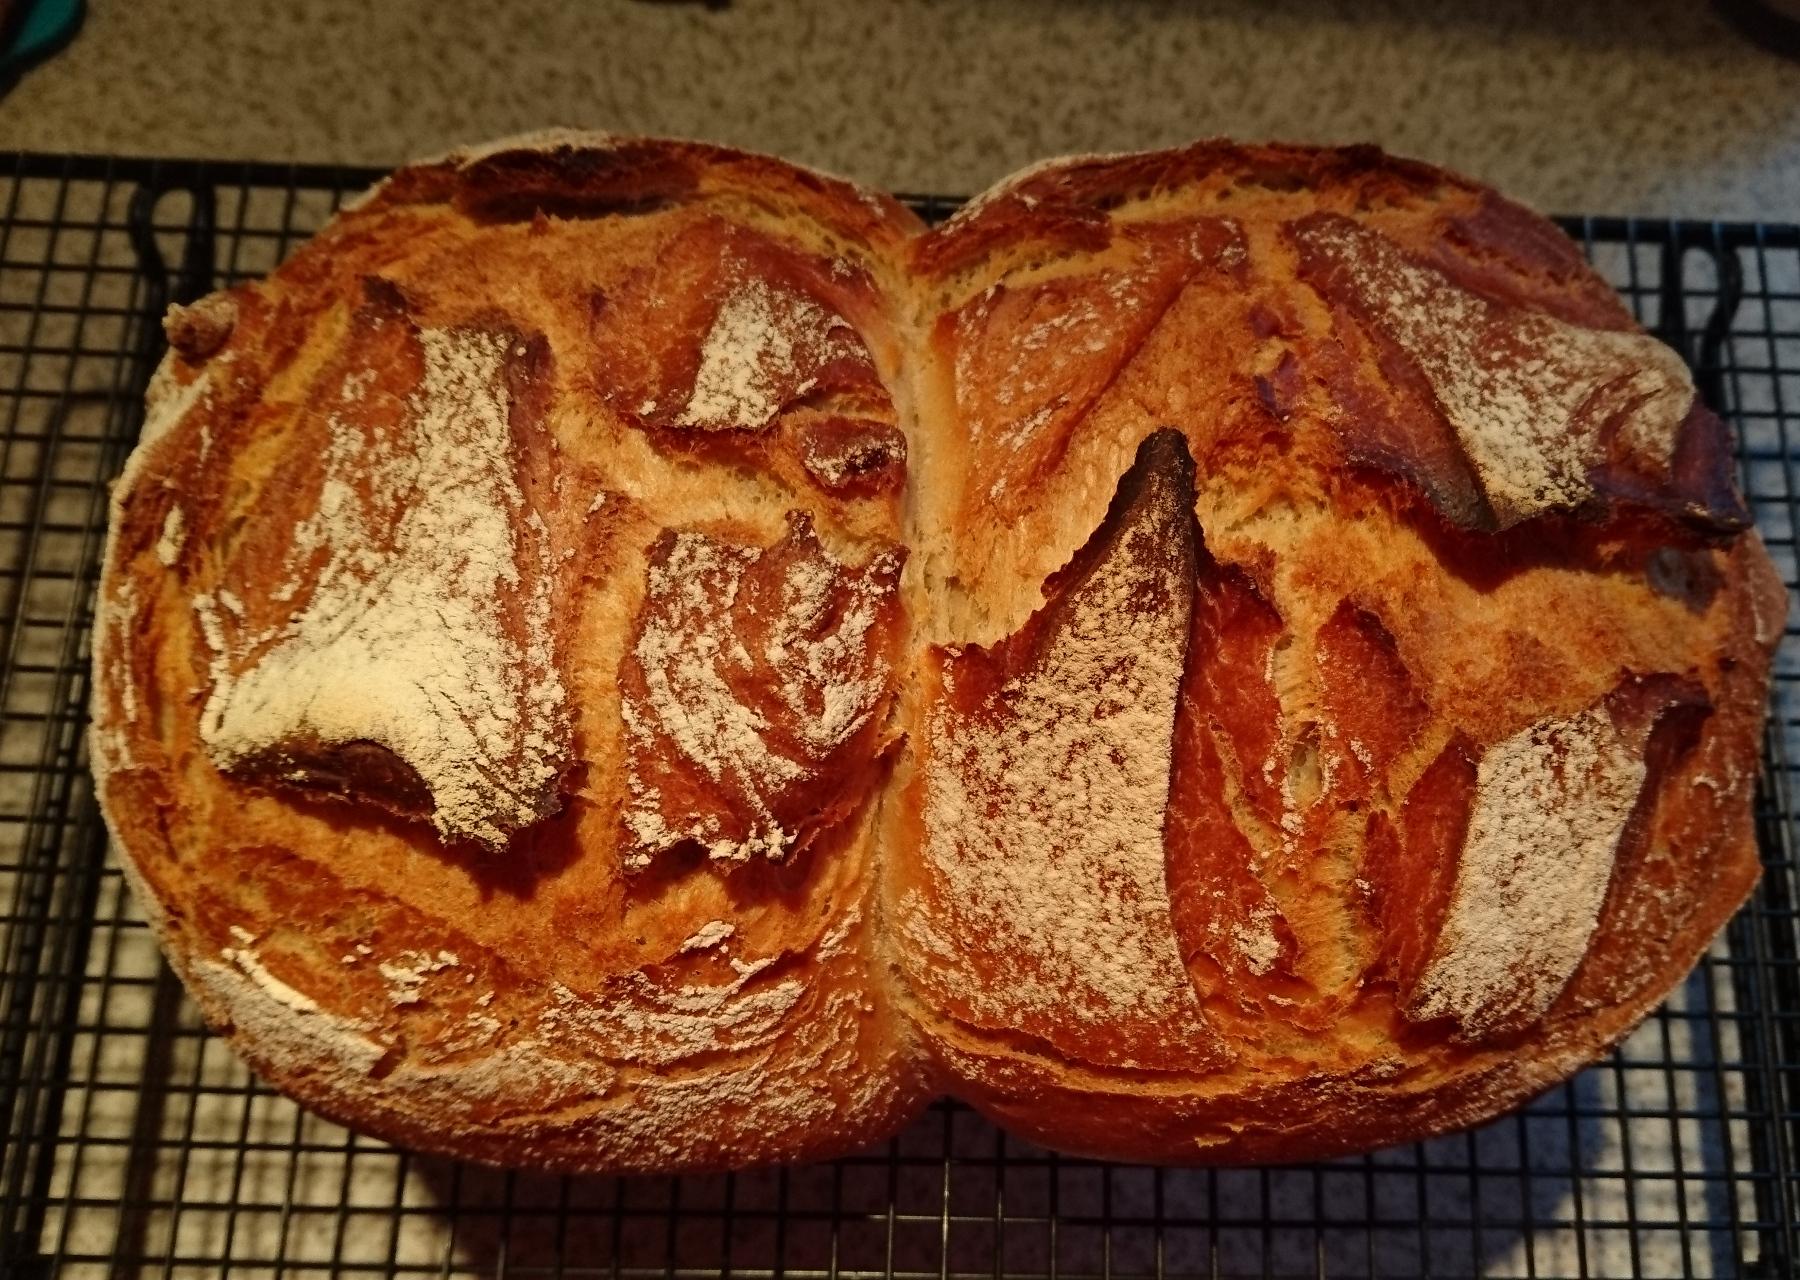 Sausa-Brot aus dem Zaubermeister